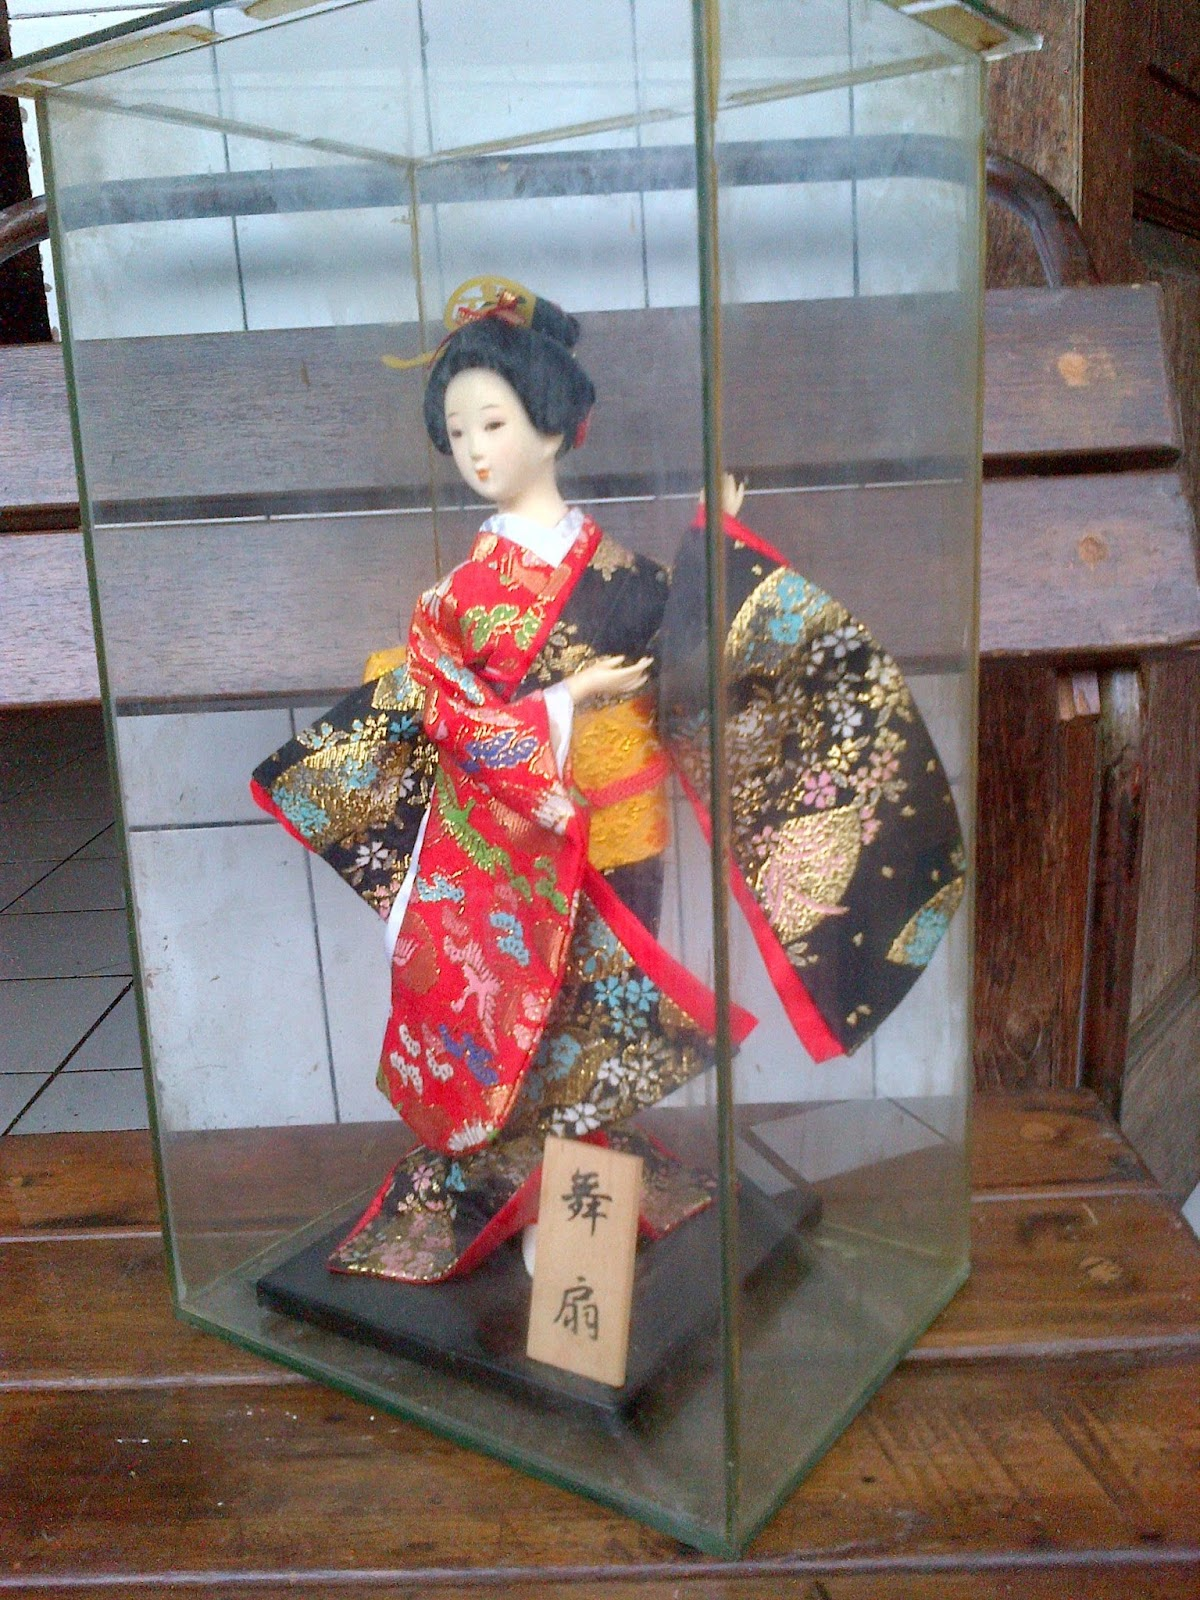 Gaya Antik galeri   Gaya Antique Gallery  Boneka Pajangan Jepang ... 83db3b5ed0